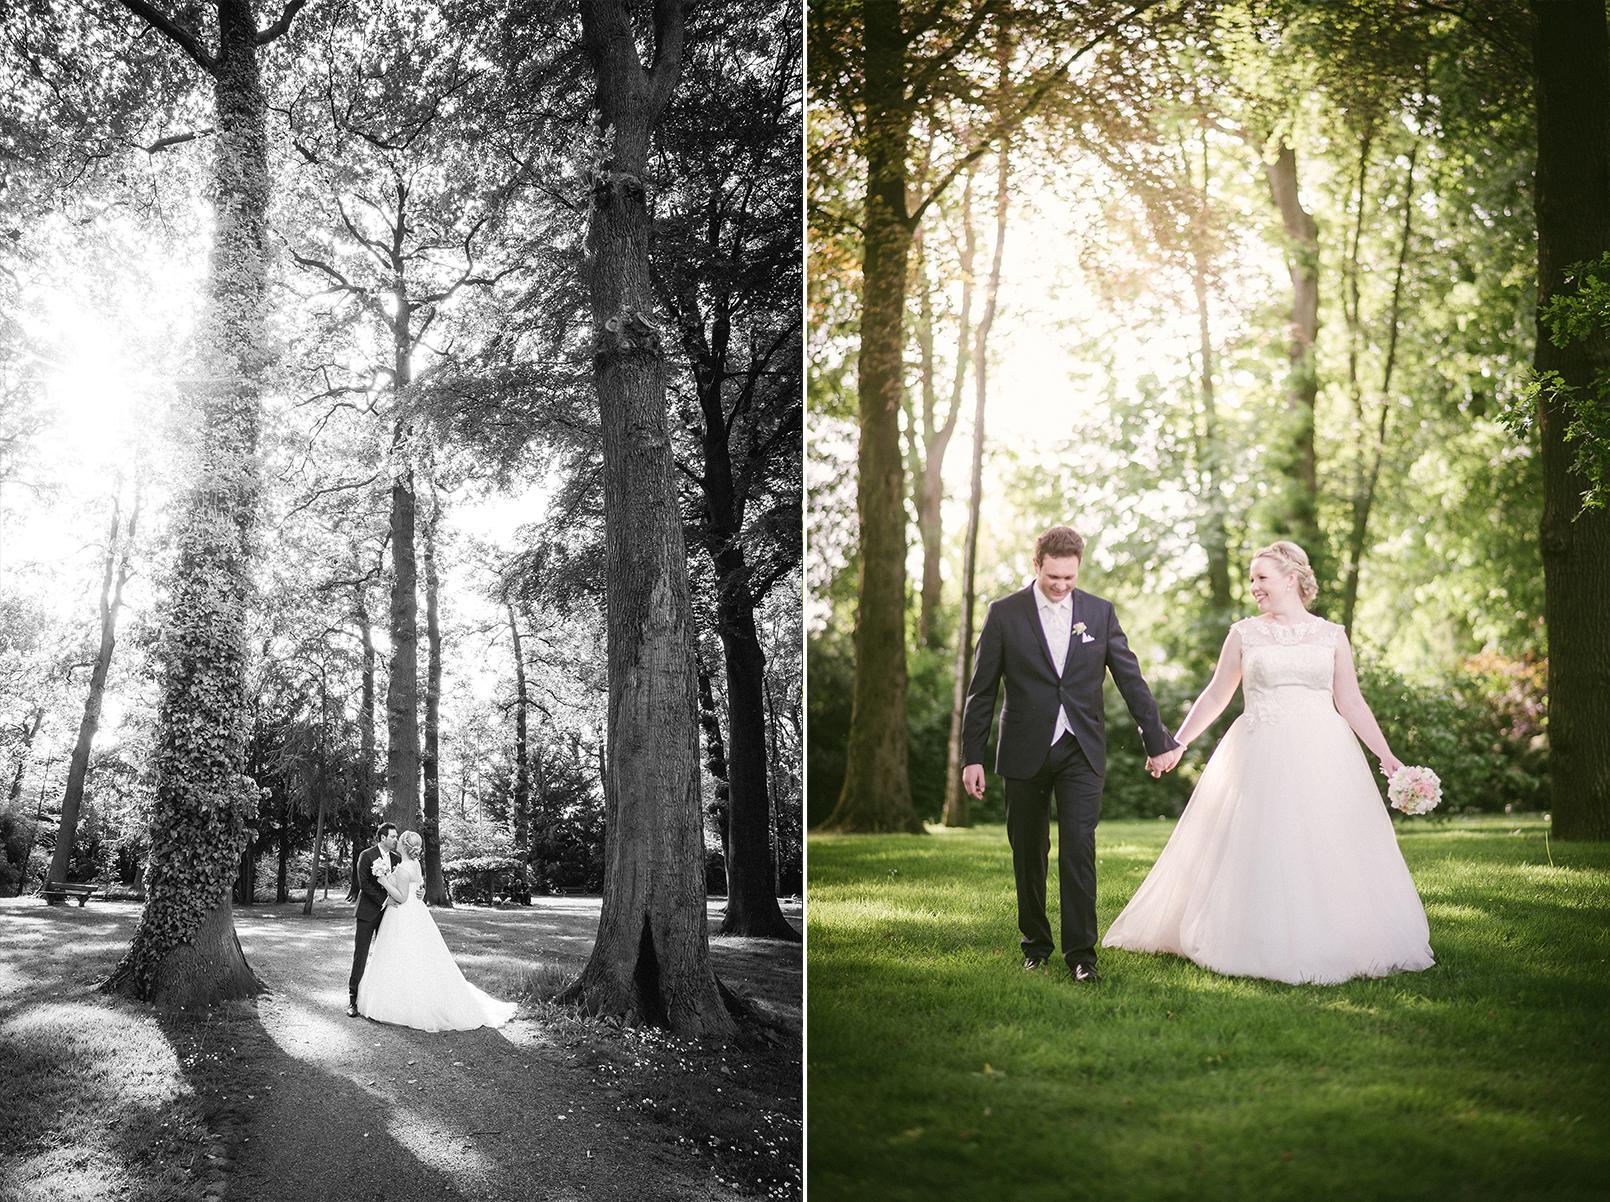 Hochzeitsfotografie-Heinsberg-Aachen-Wegberg-Dreamcatcher-Fotograf-0001 (26)